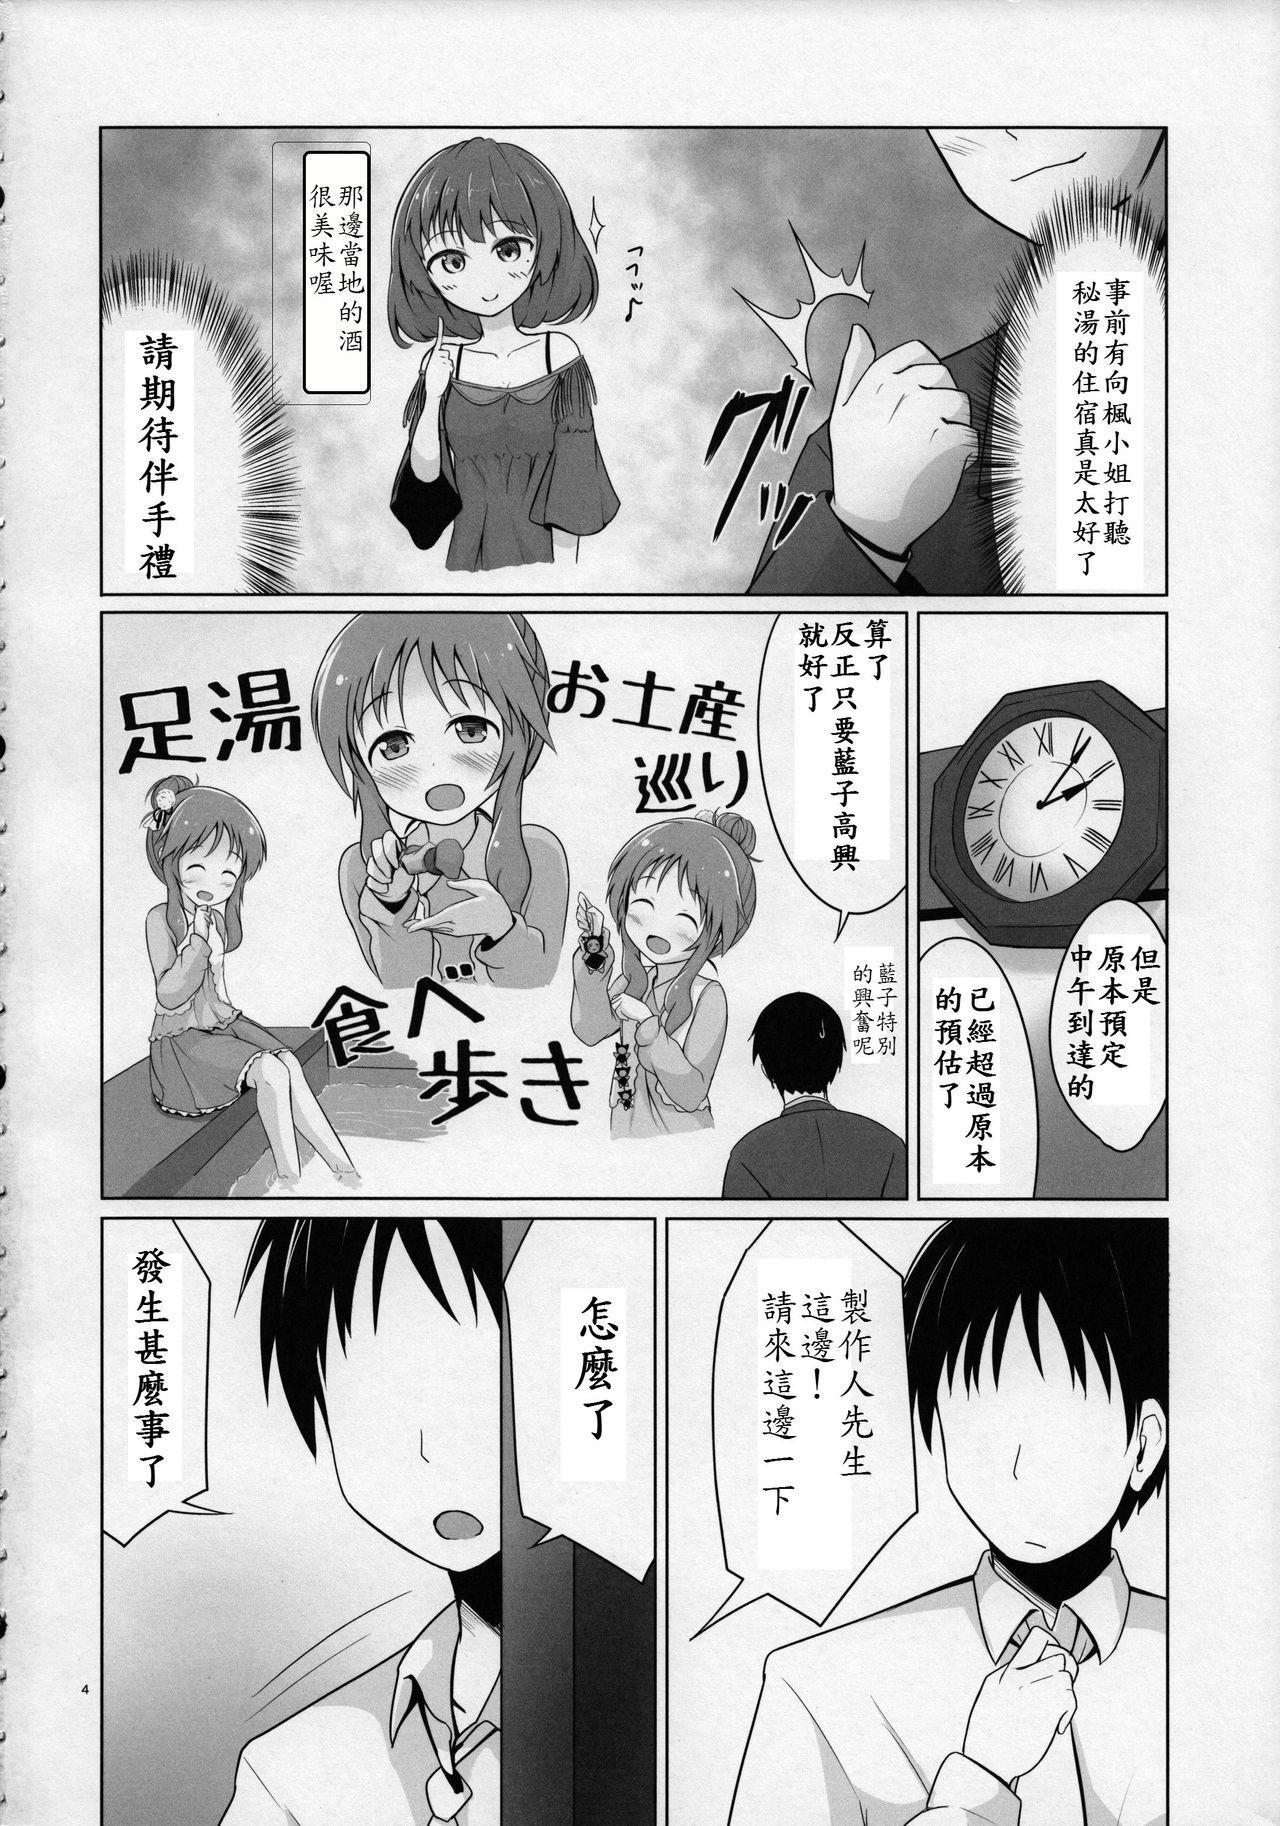 Aiko Myu Good ~Aiko good communication~ 3